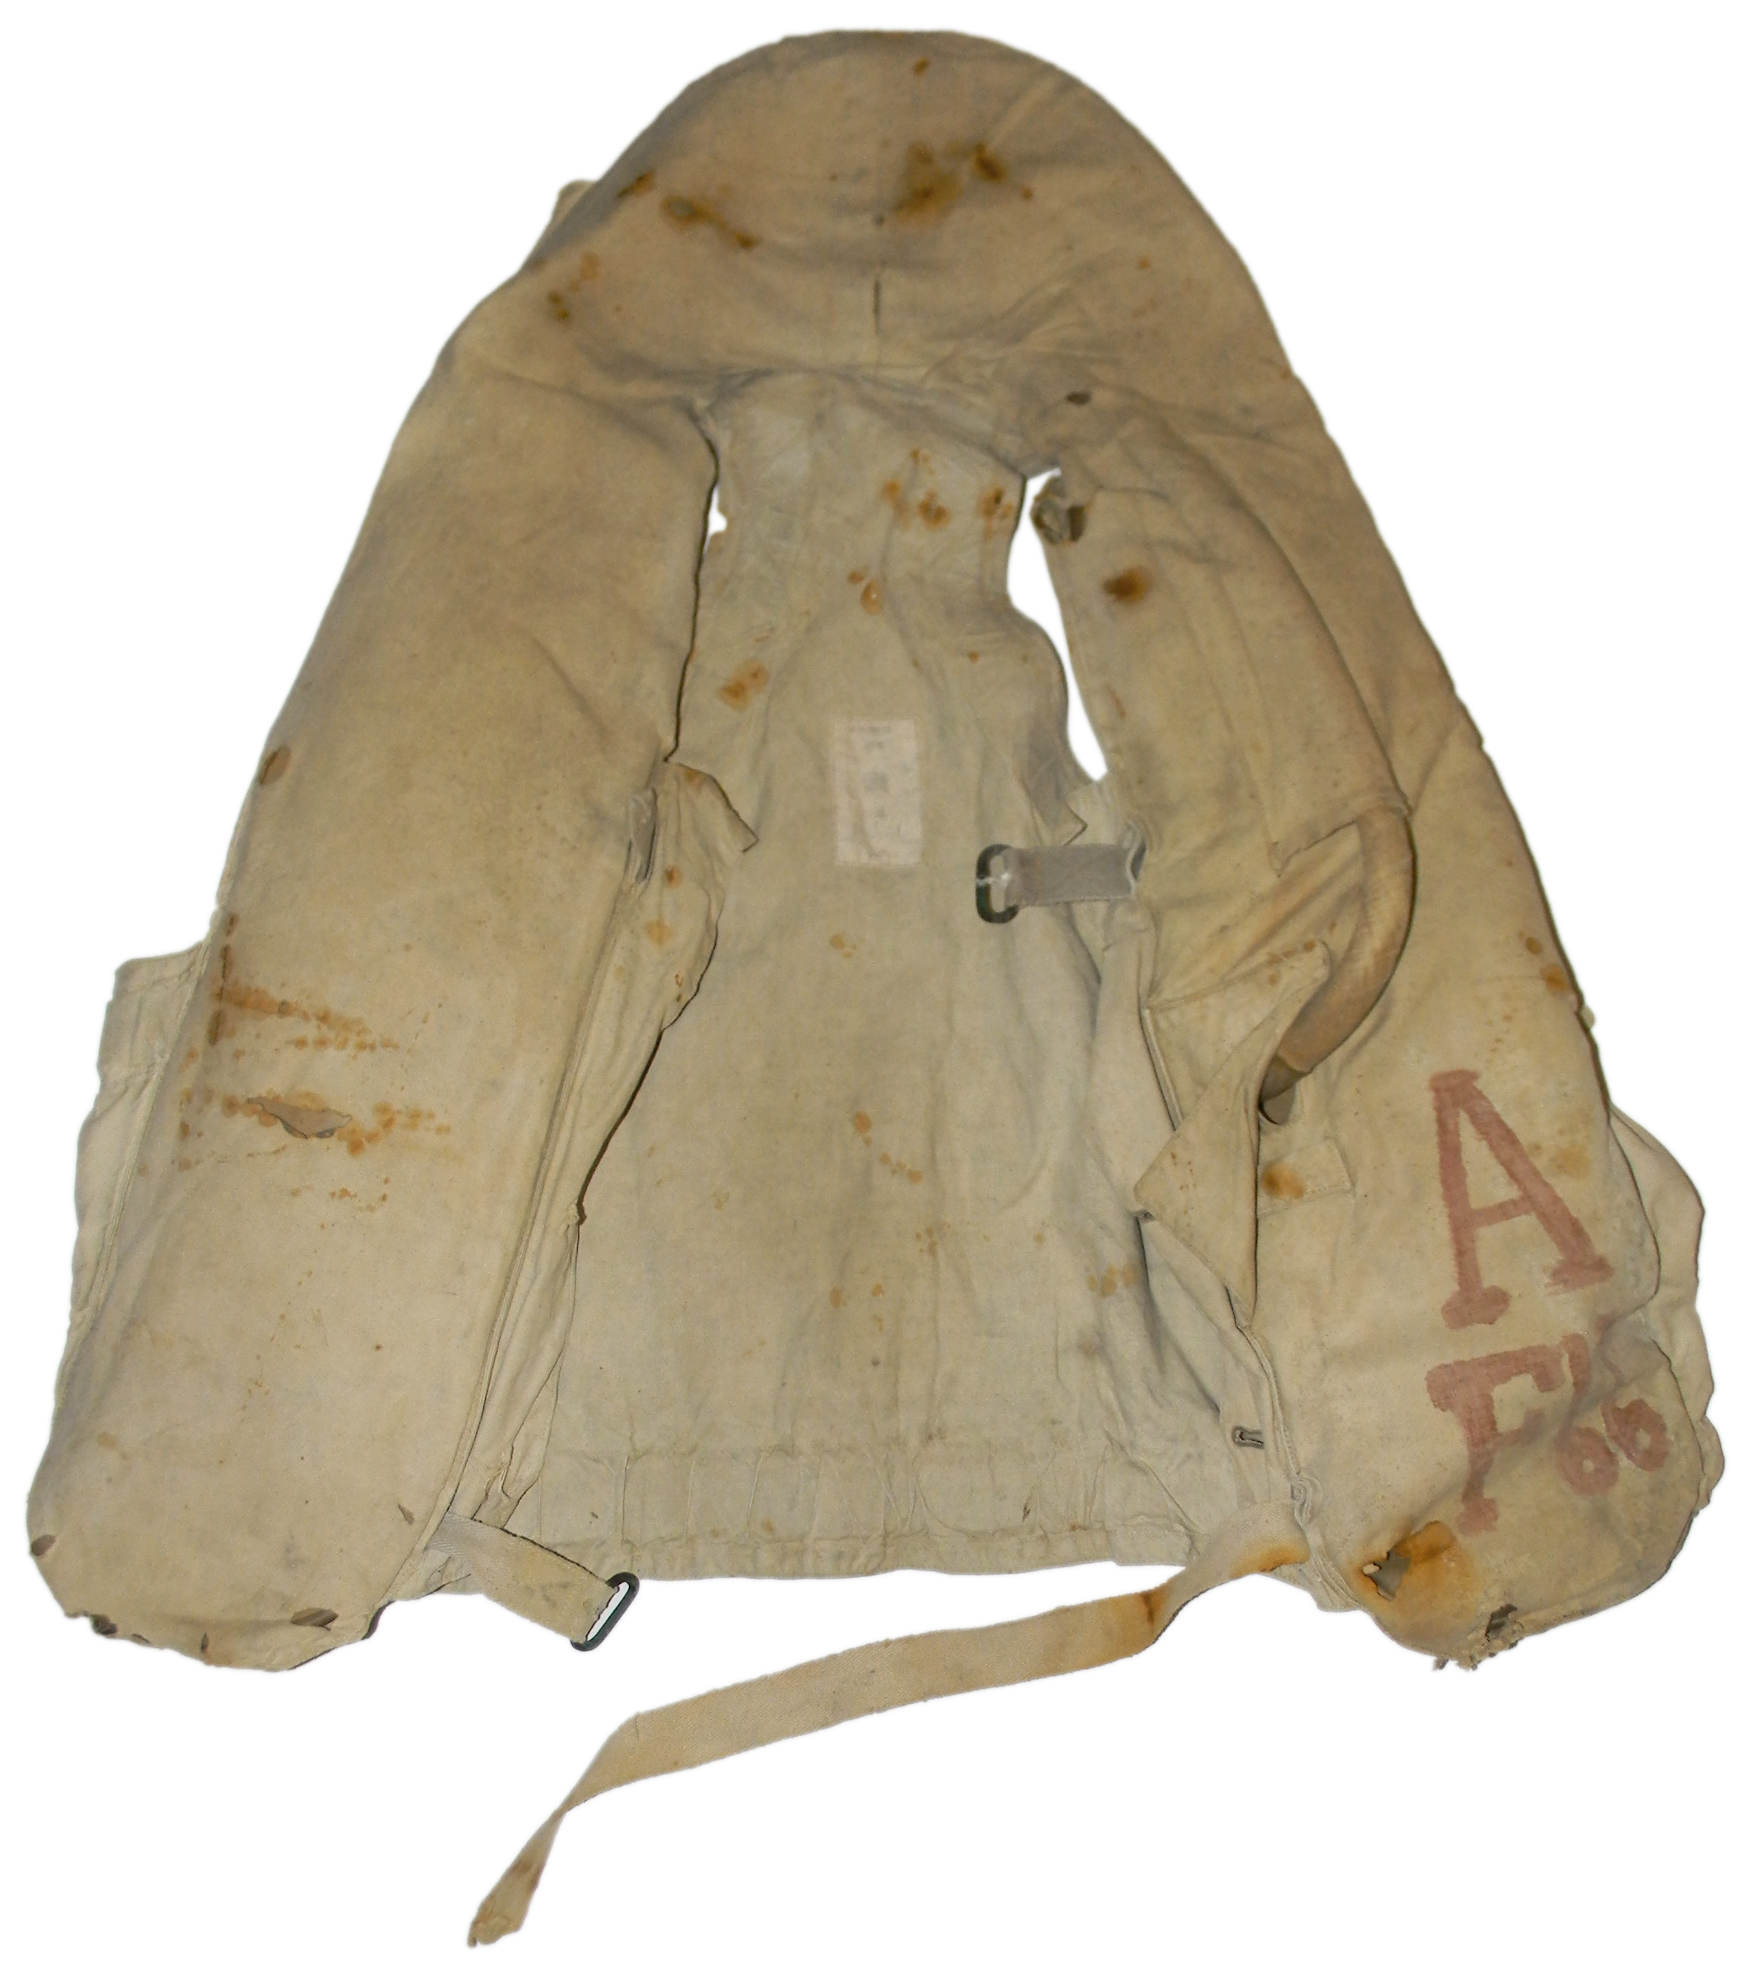 RAF 1932 pattern life vest